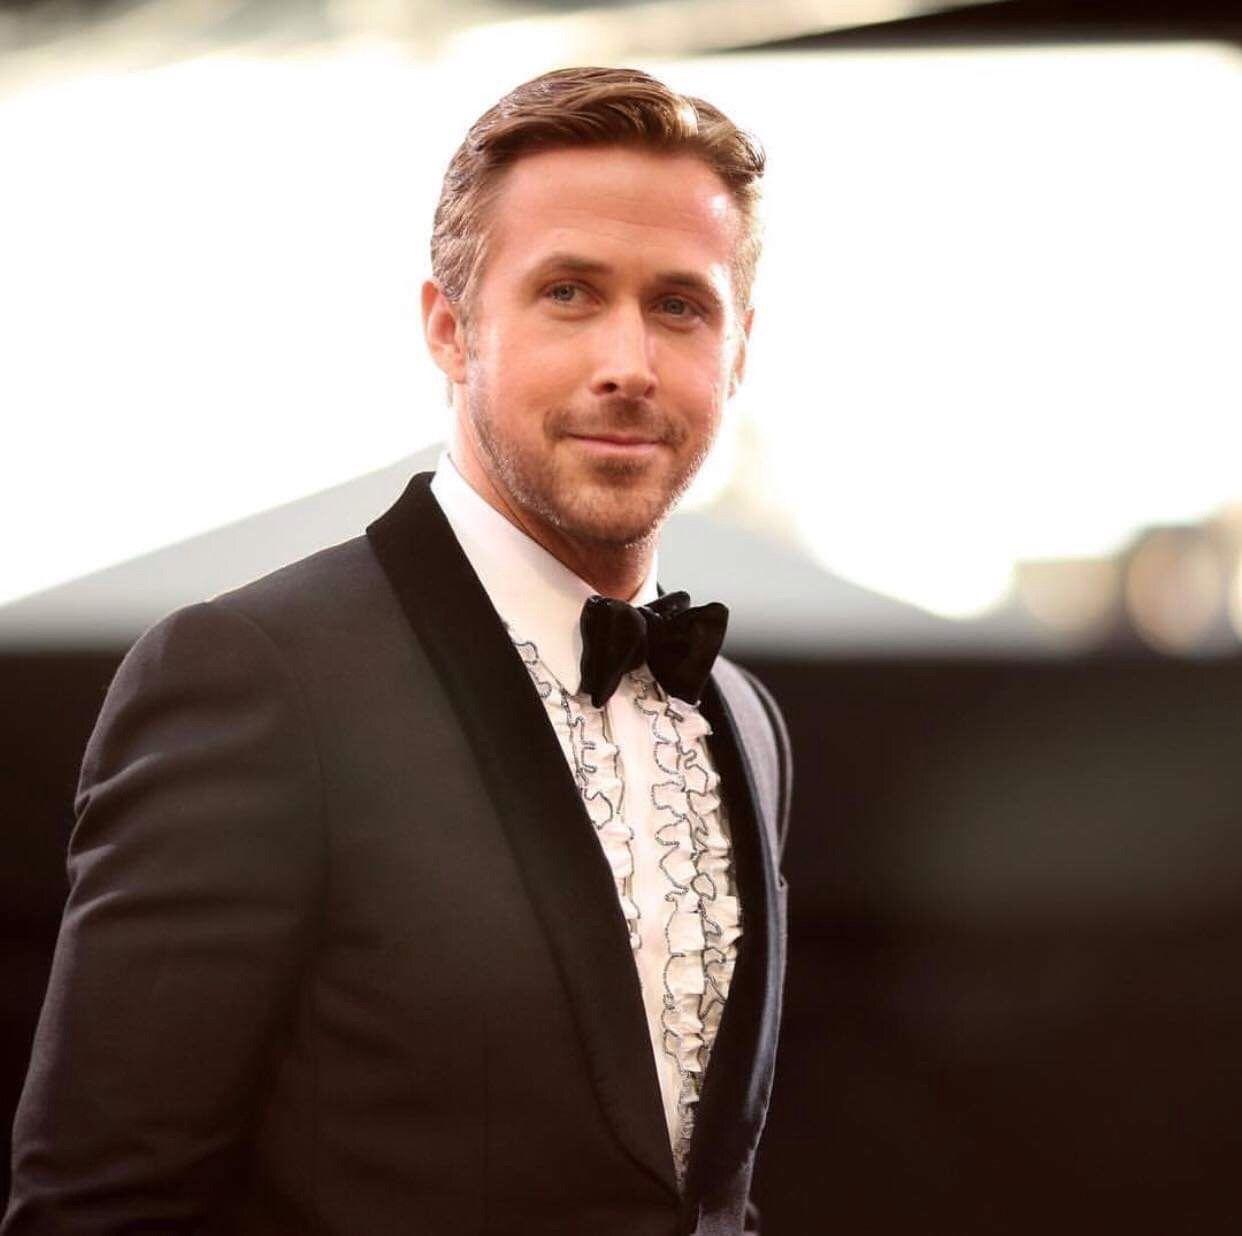 Ryan Gosling | Ryan gosling, Hollywood celebrities, Hollywood